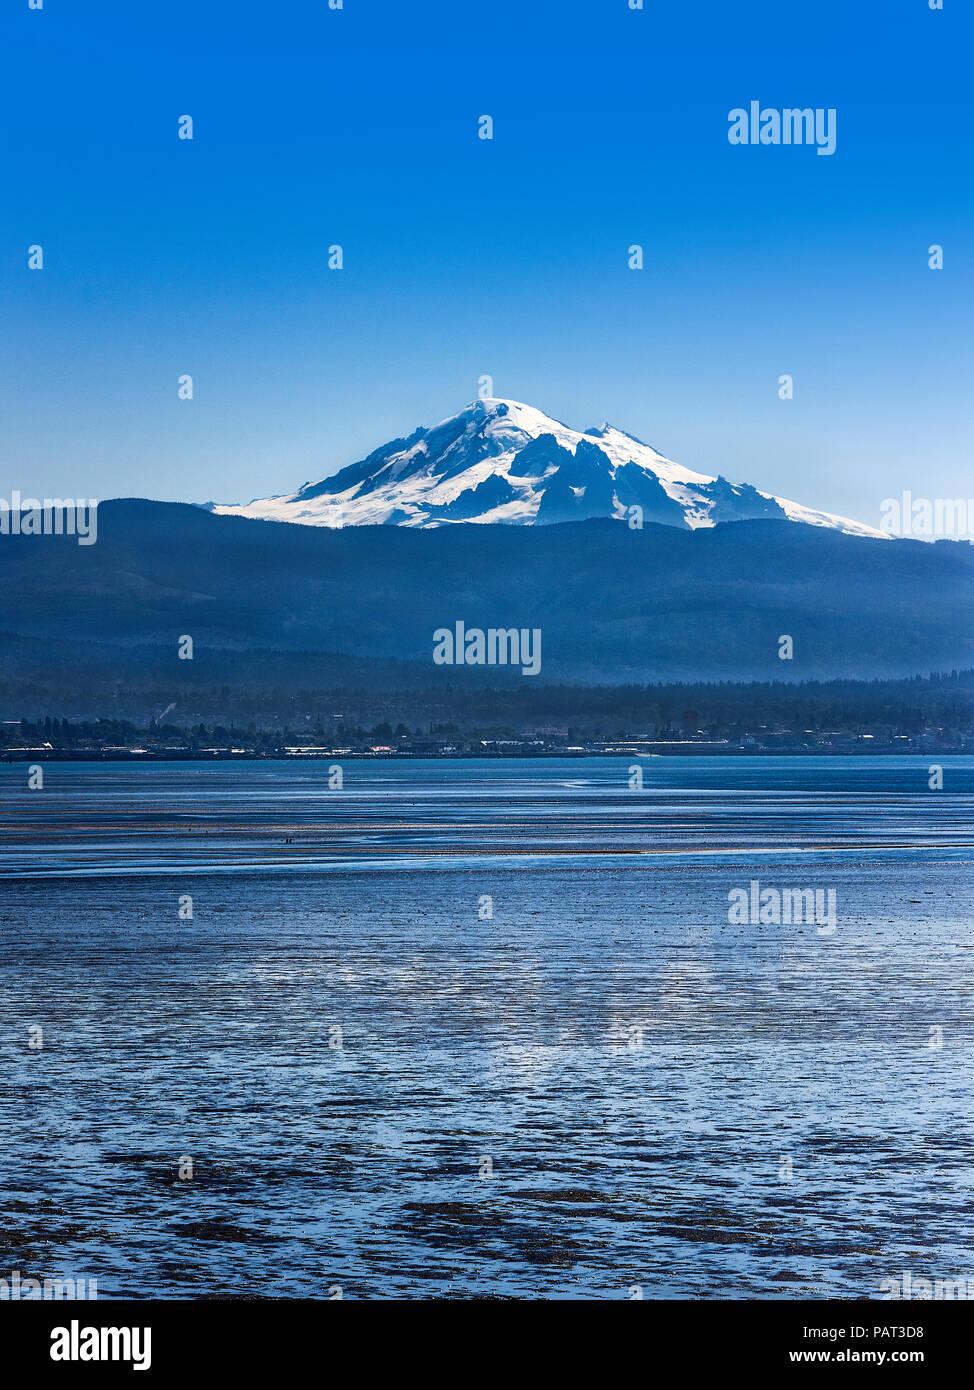 Mt. Baker across Bellingham Bay, Bellingham, Washington, Pacific Northwest, USA. - Stock Image